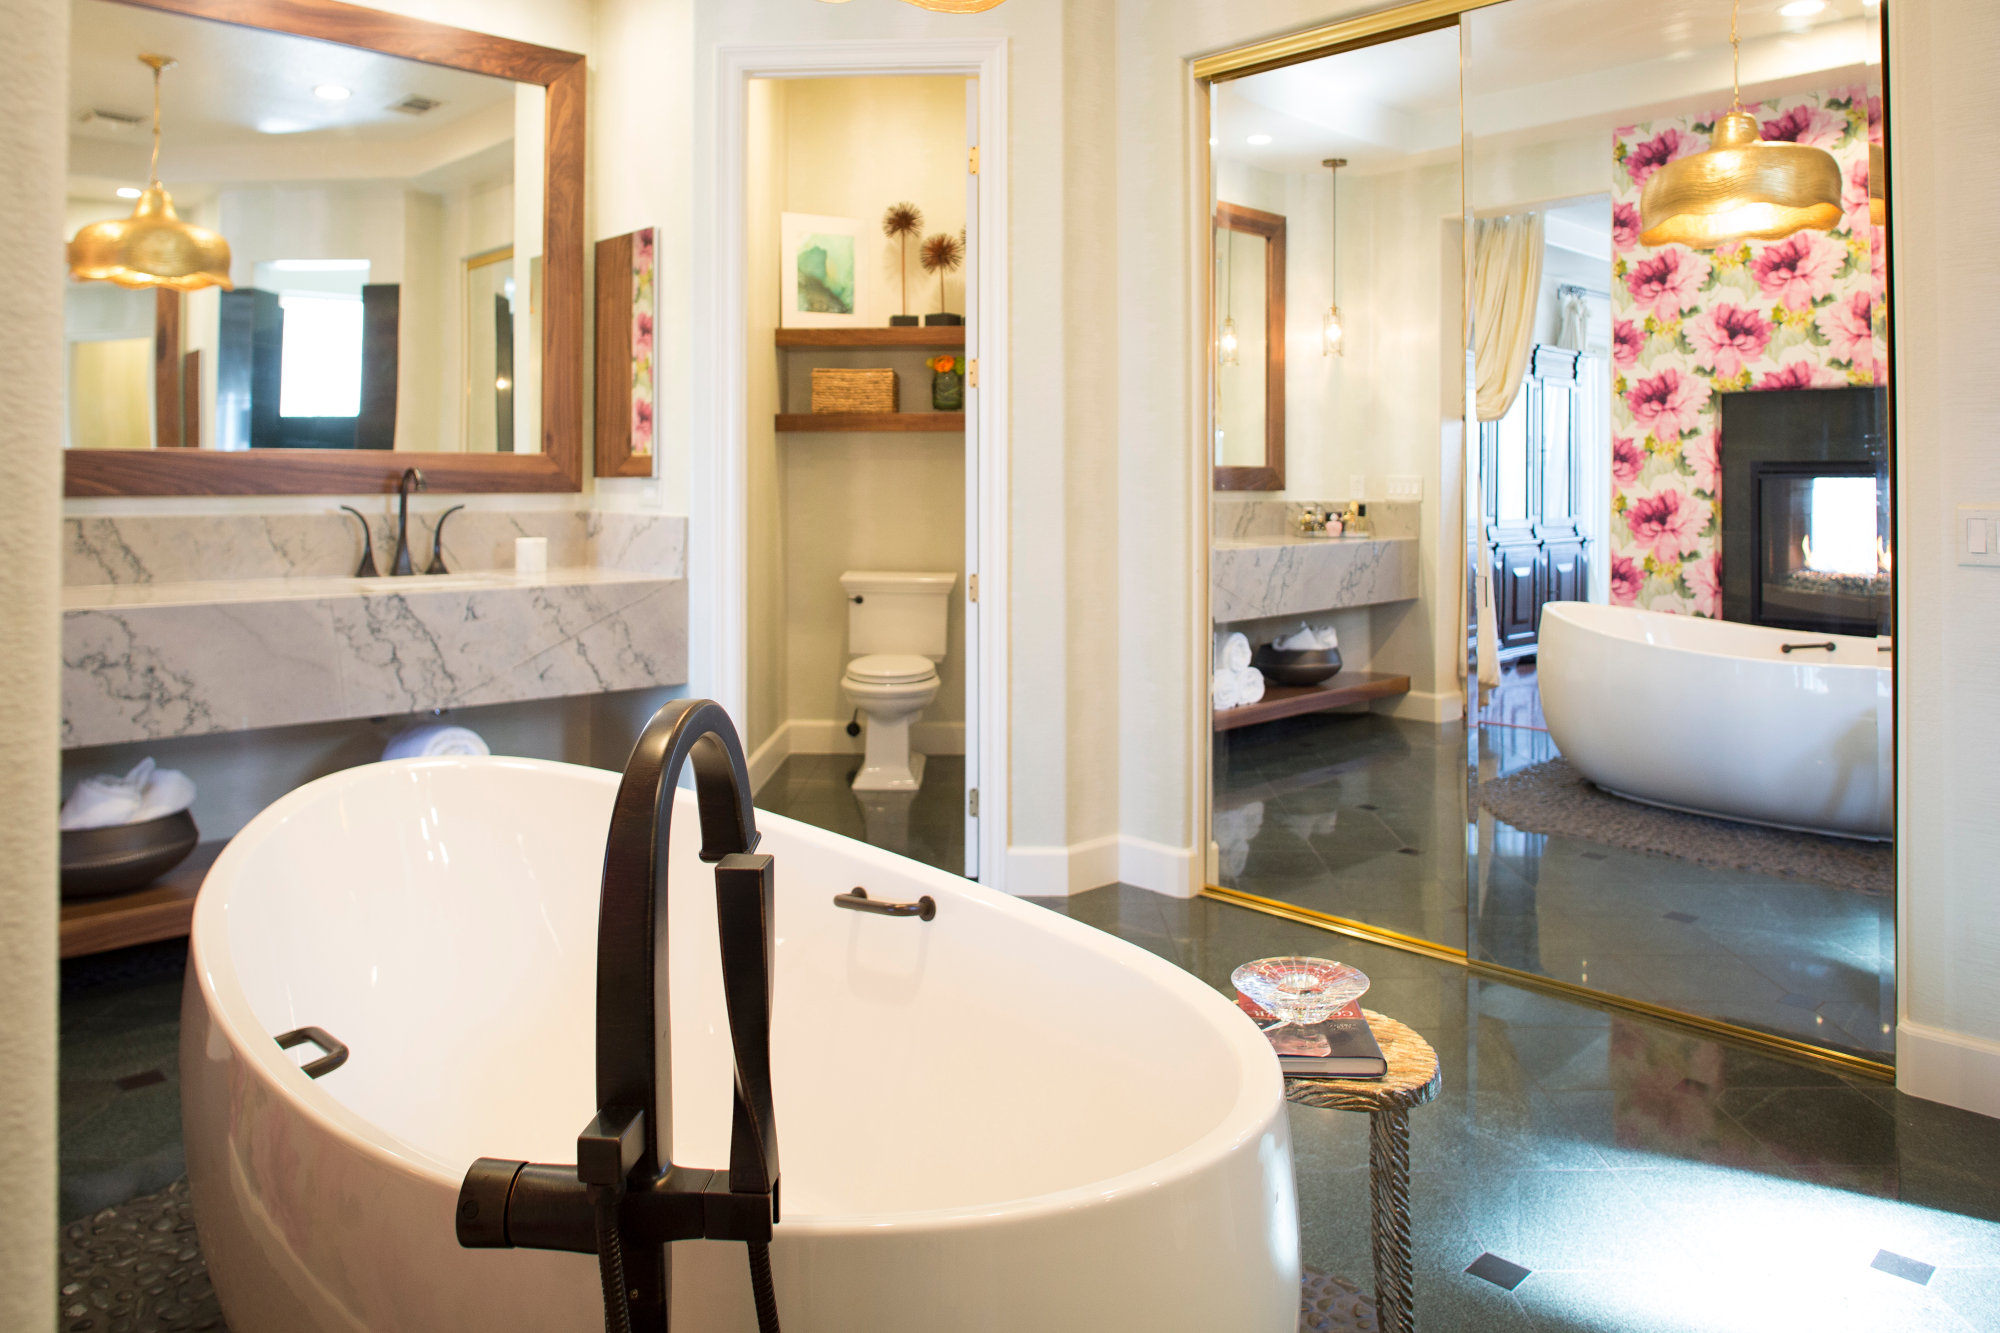 Master bathroom with free standing tub, fireplace, custom marble vanity.